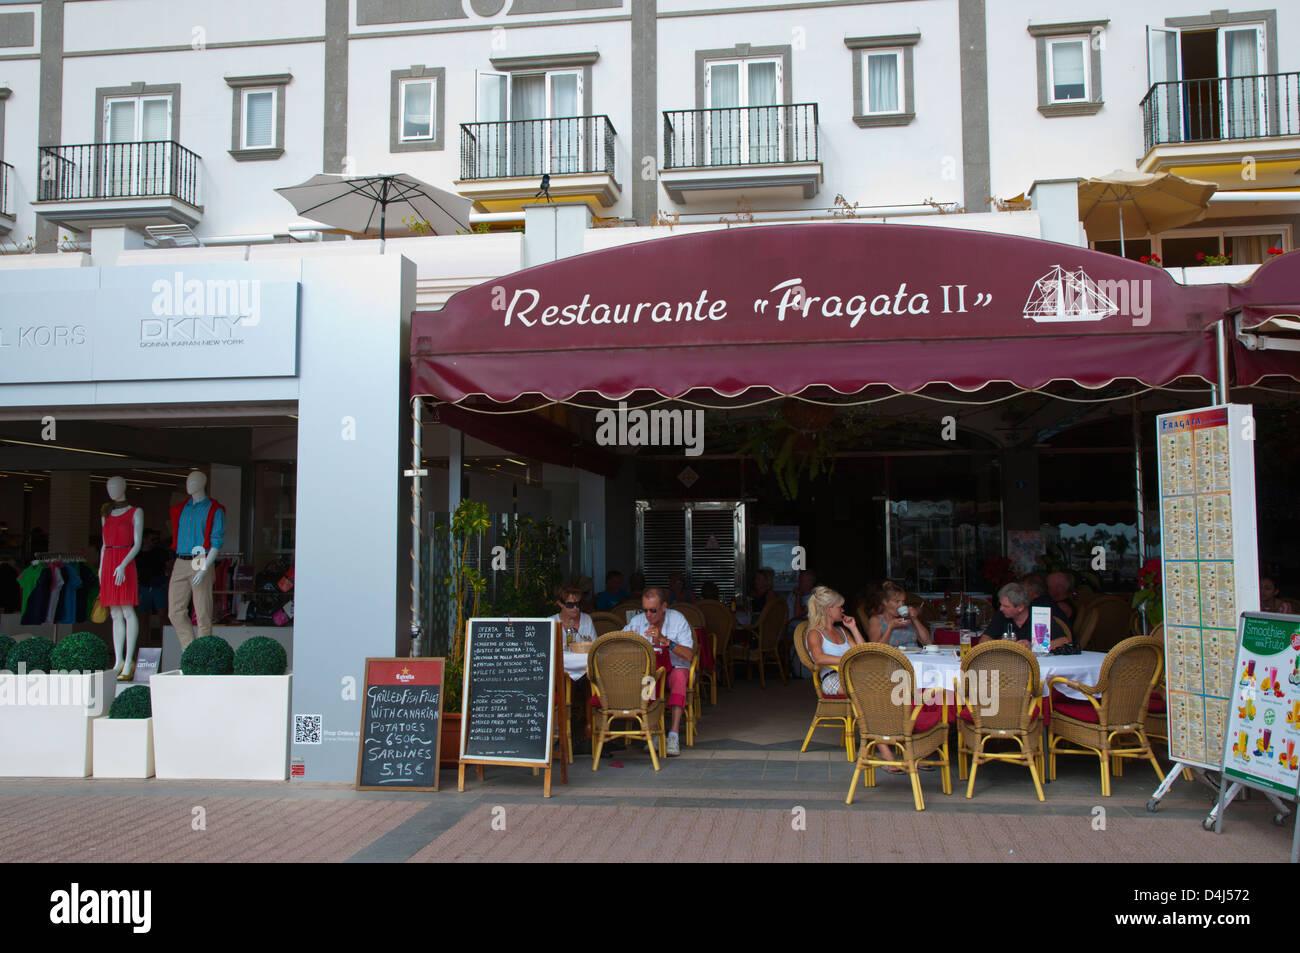 Restaurant an der Strandpromenade Puerto de Mogan Resort Gran Canaria Insel der Kanarischen Inseln-Spanien-Europa Stockbild